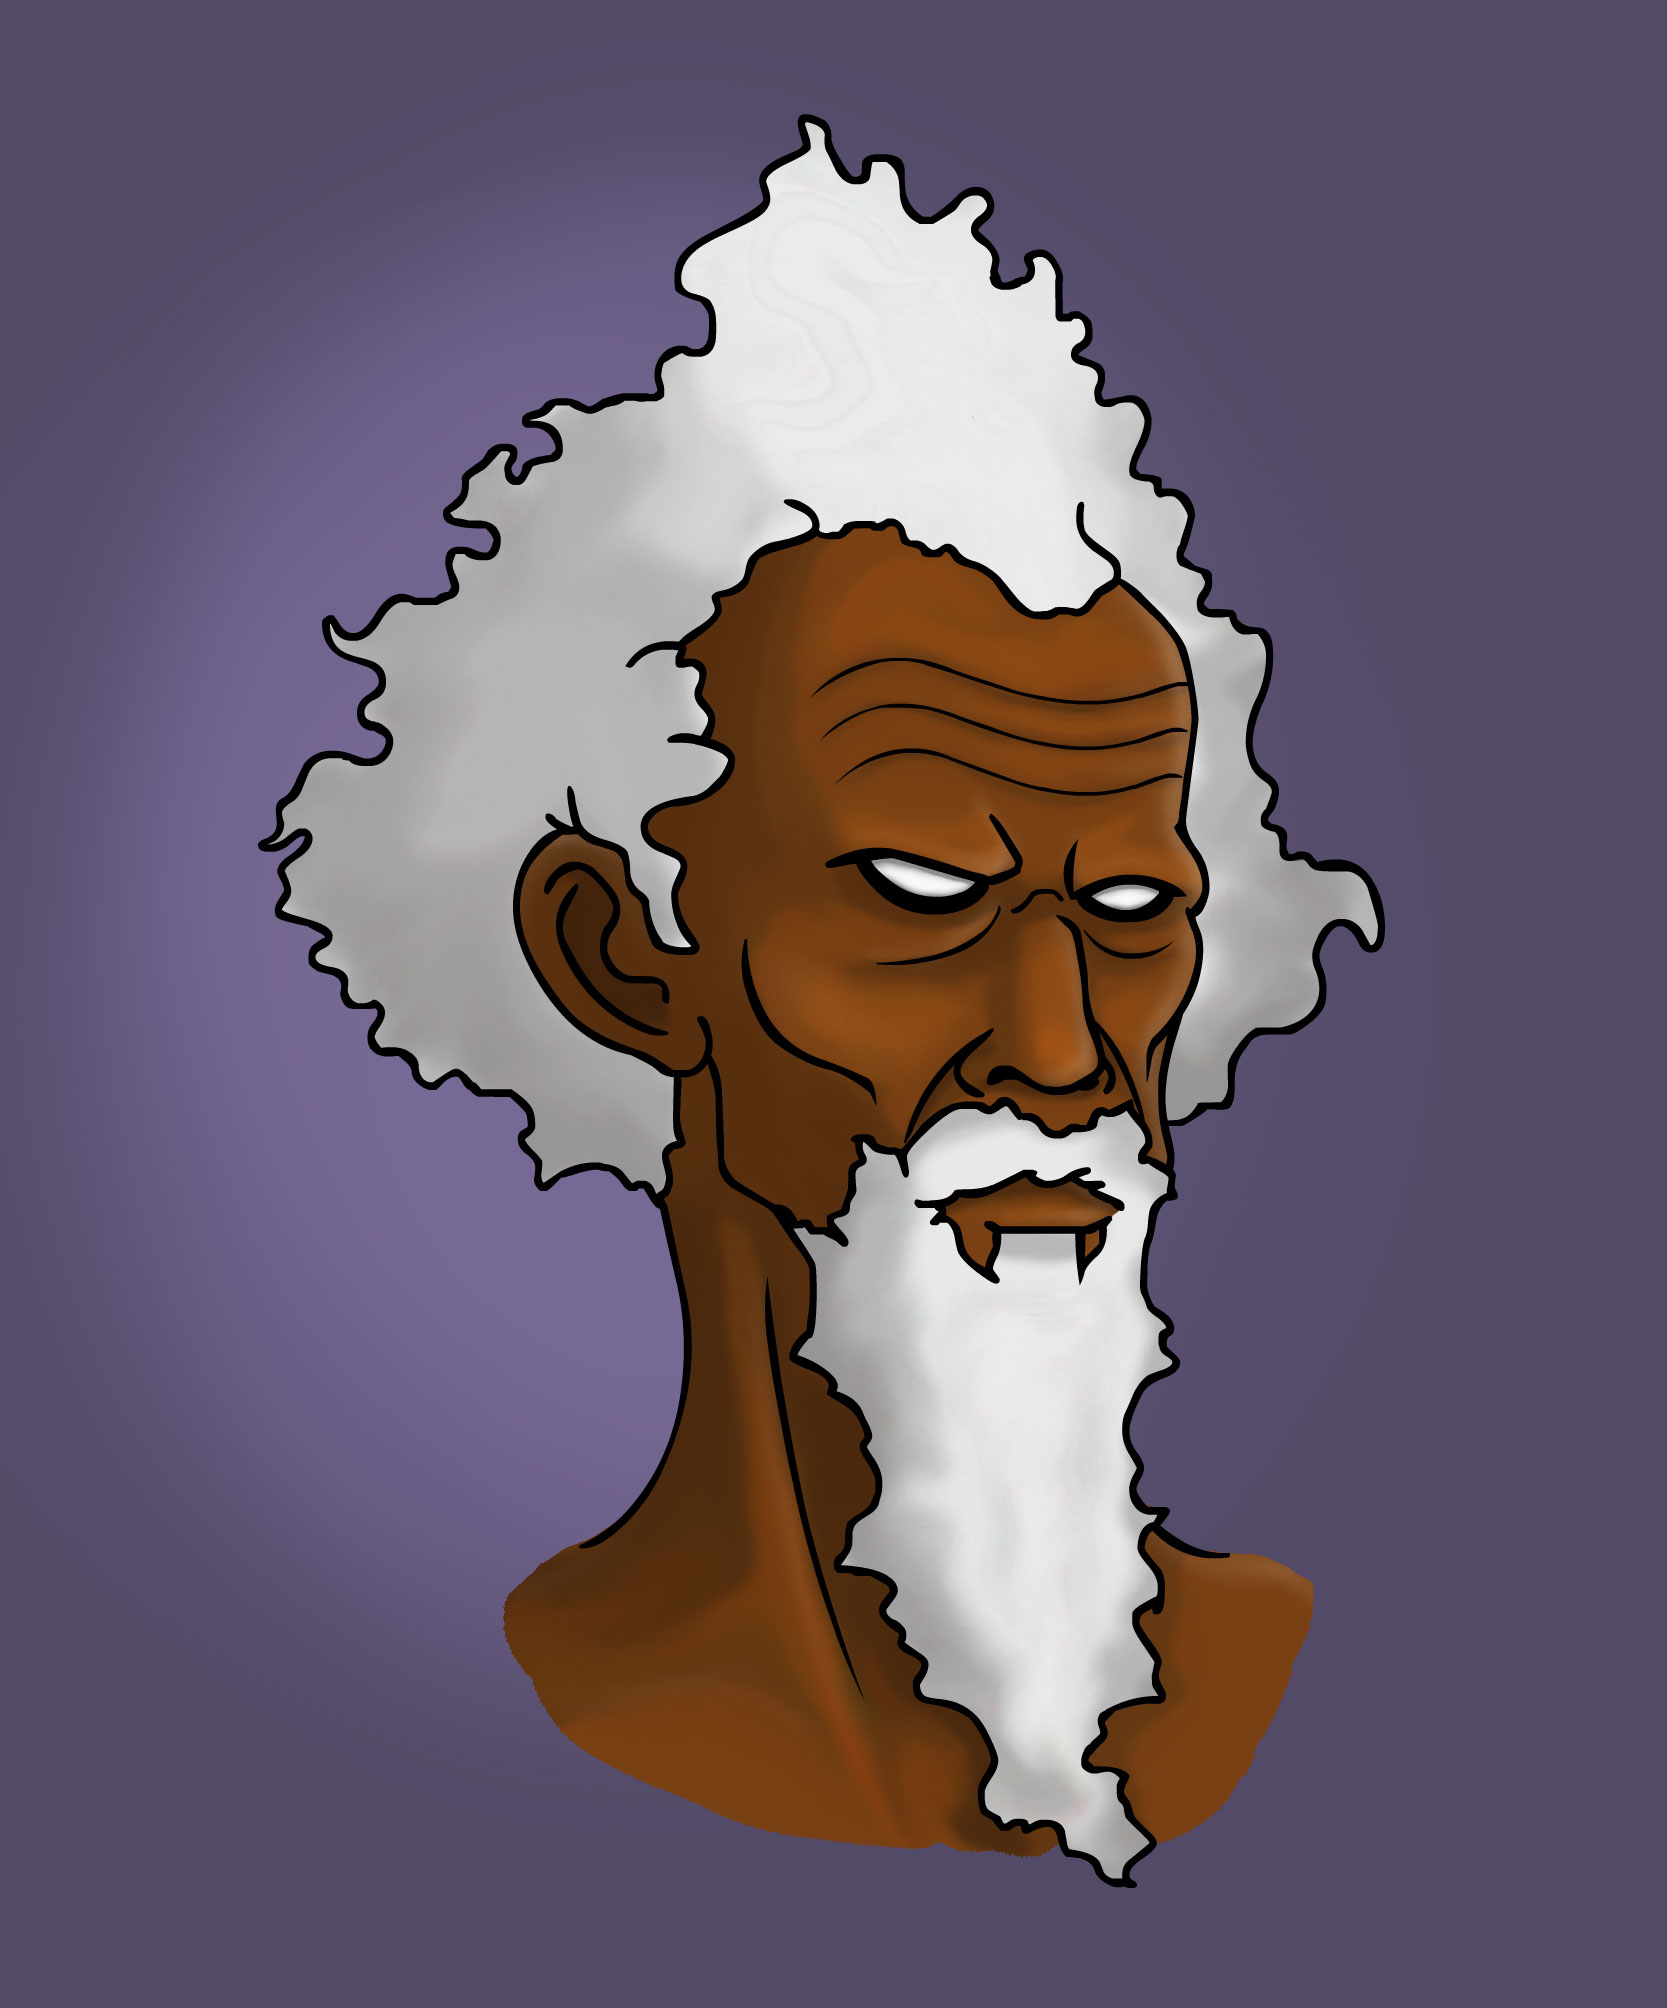 Lord Hekihumu